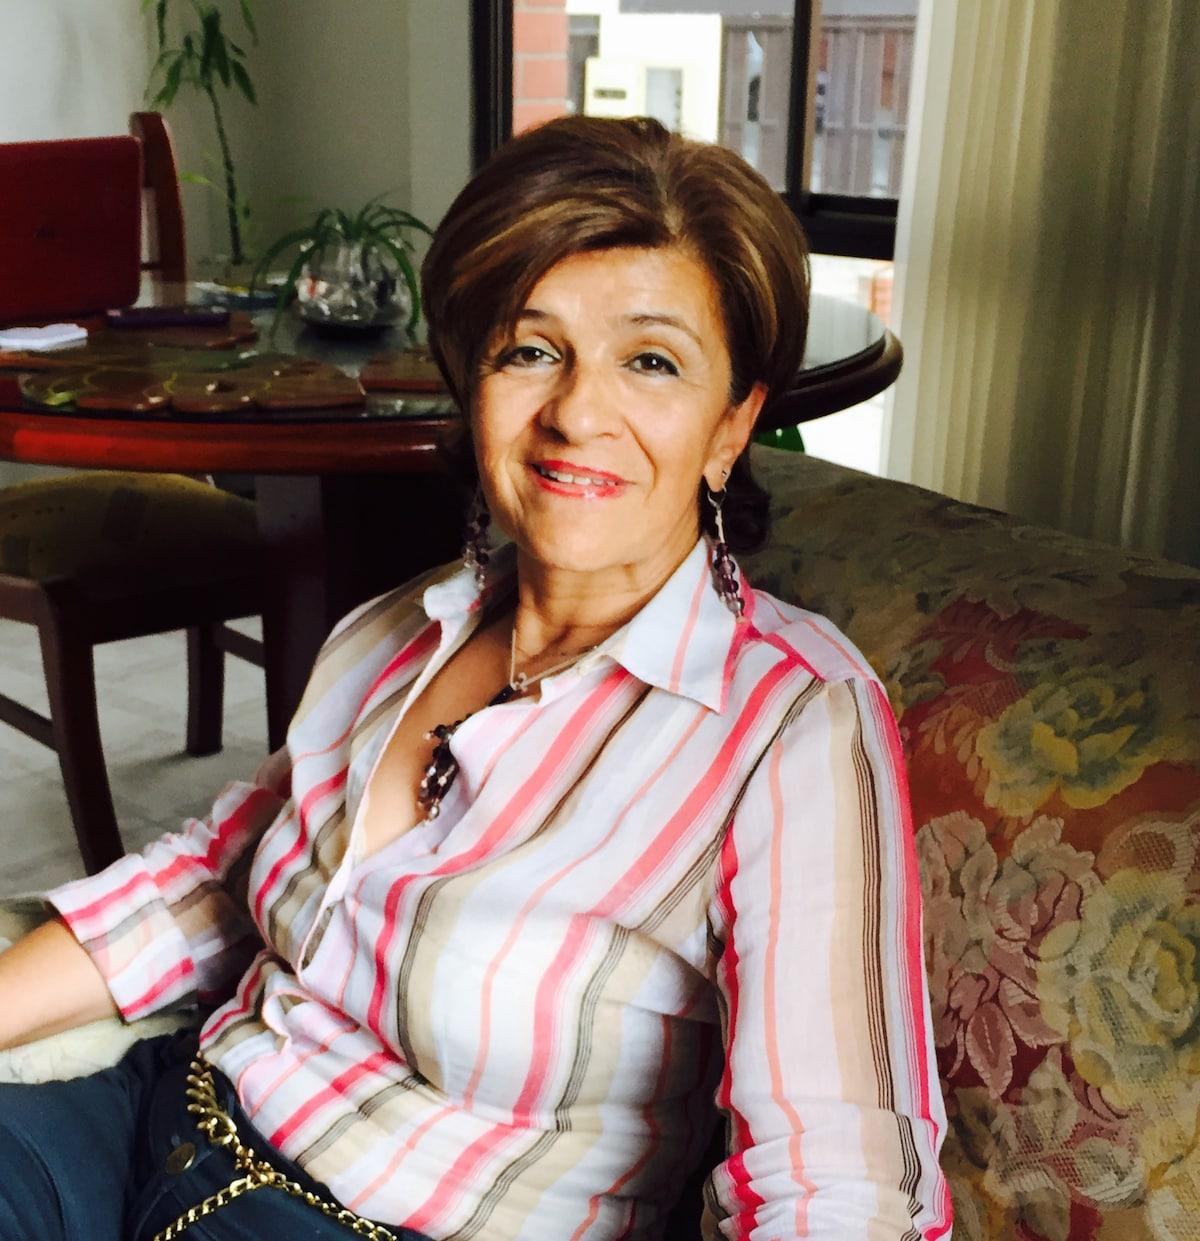 Beatriz from Manizales